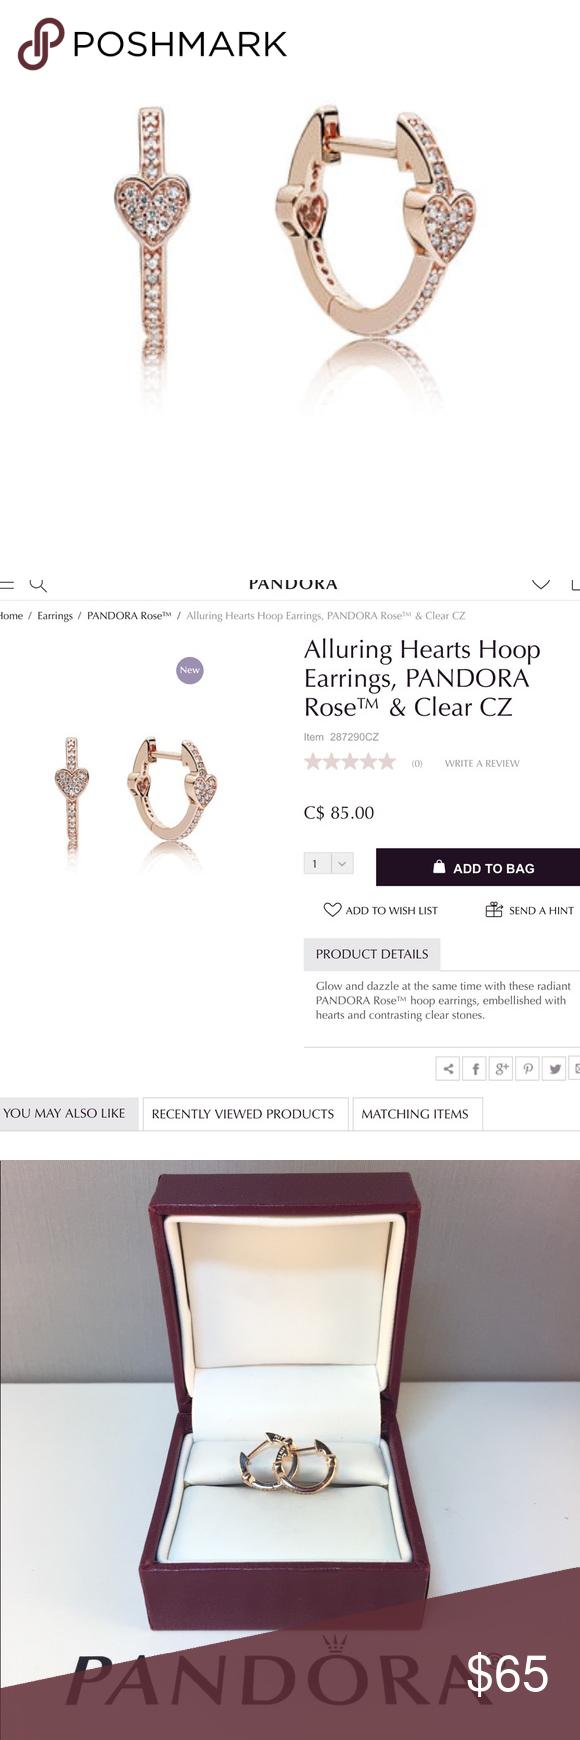 56b533b9f New Pandora Rose Alluring Hearts Earrings 100% Authentic Pandora Pandora  Charms. Pandora New Charms. Pandora Retired Charms. Pandora Bracelets.